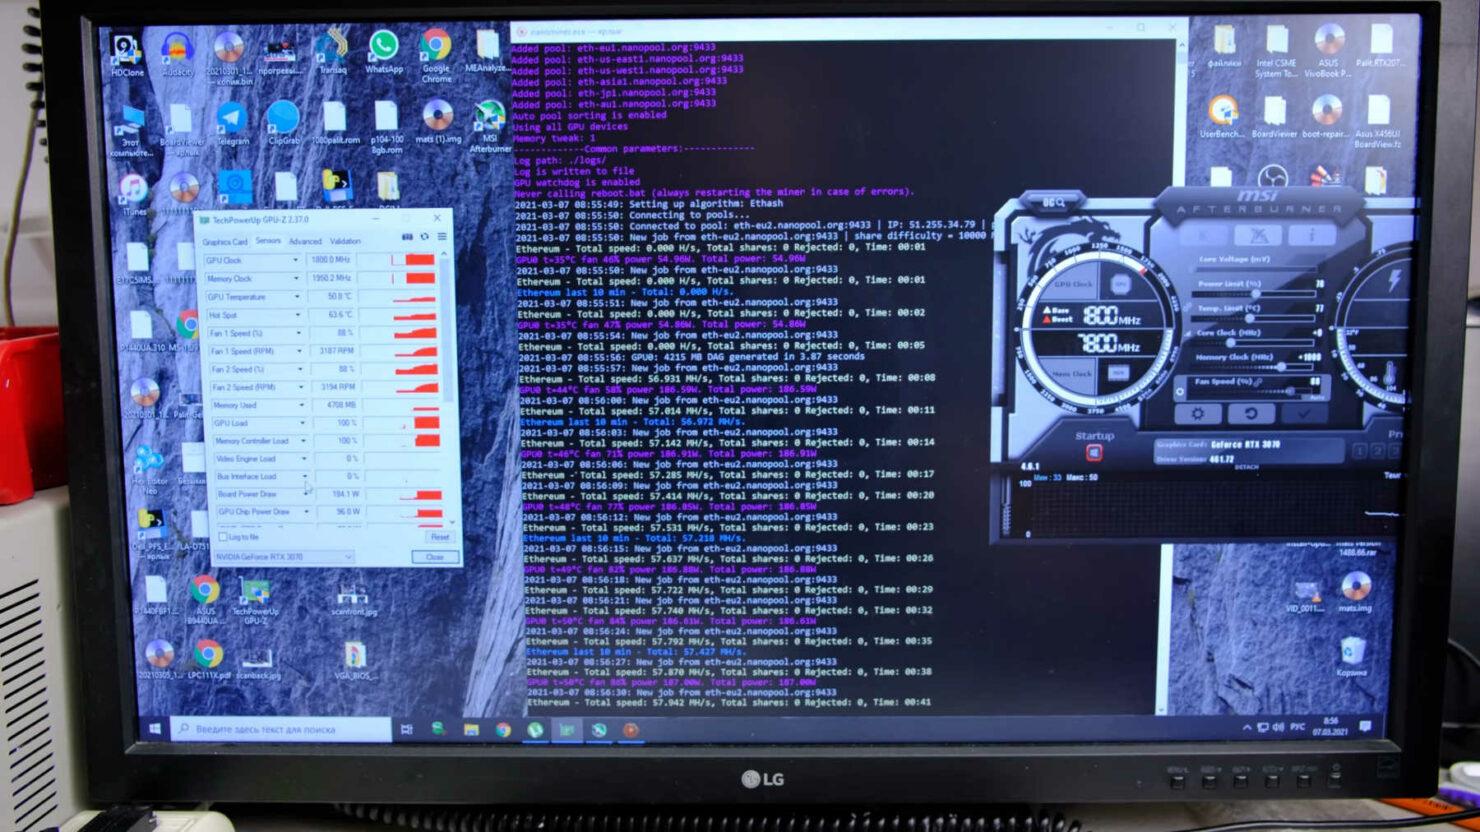 nvidia-geforce-rtx-3070-16-gb-memory-mod-upgrade-_-vk-on-russian-modder-_3